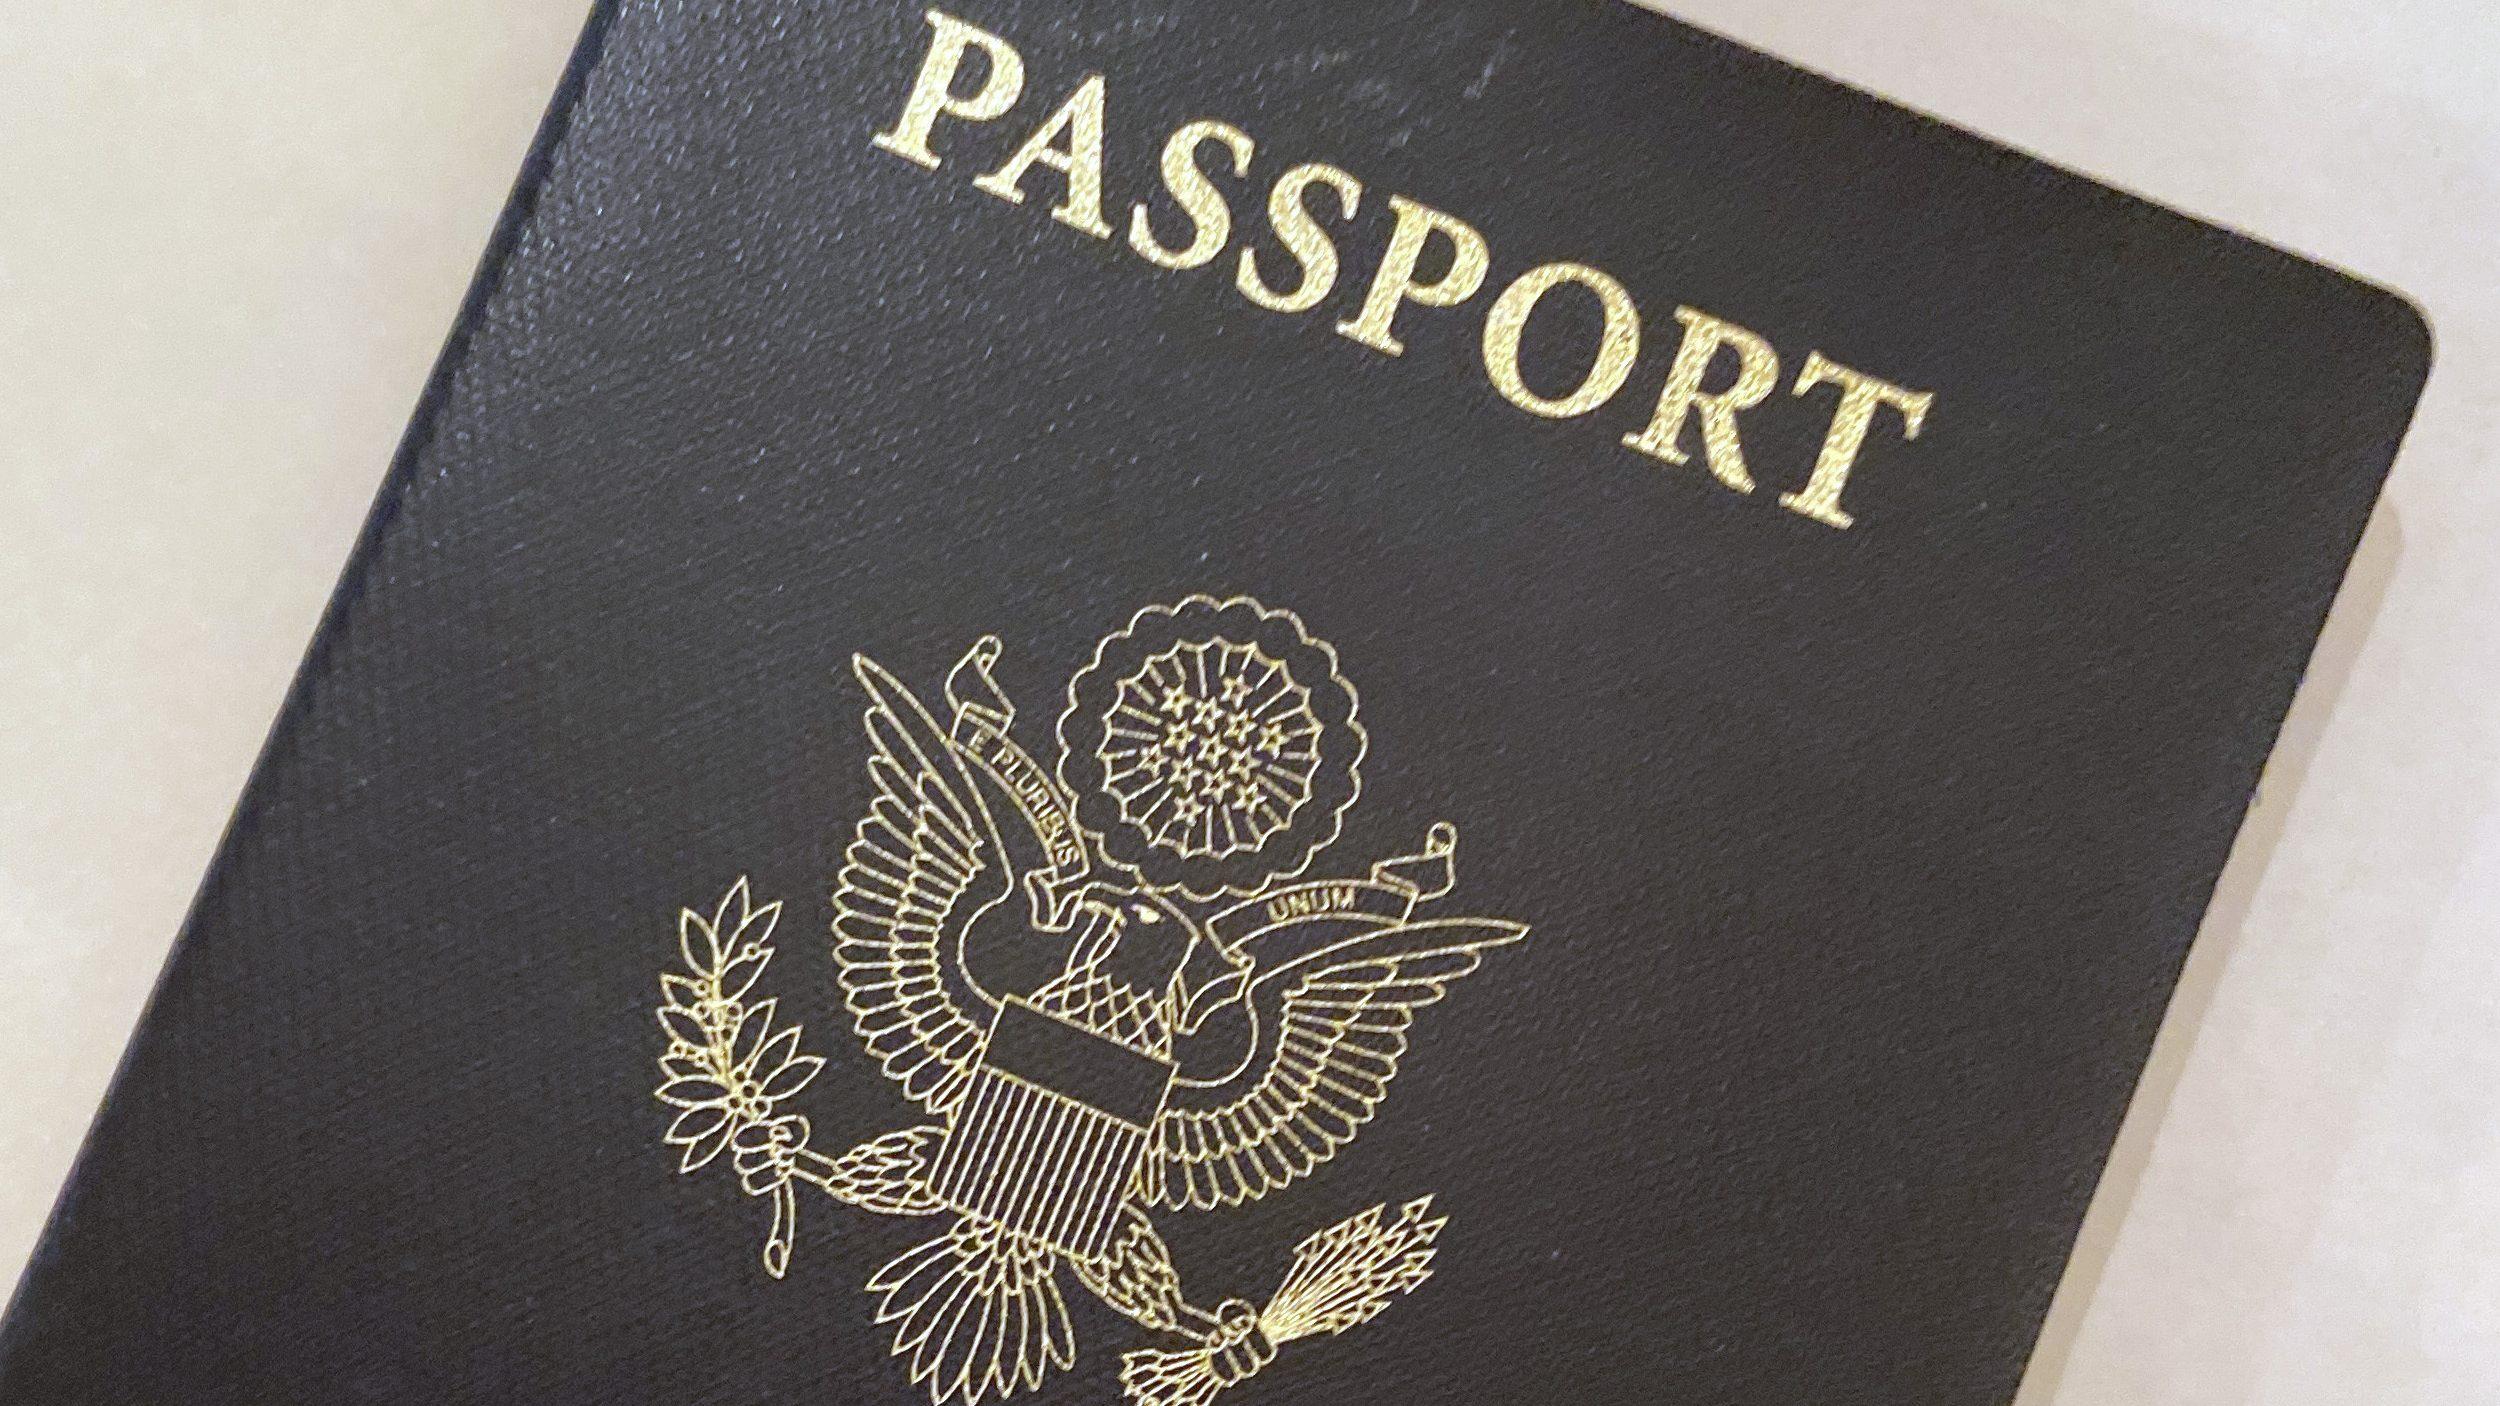 A U.S. Passport cover is seen in Washington on May 25, 2021. (Eileen Putman / Associated Press)